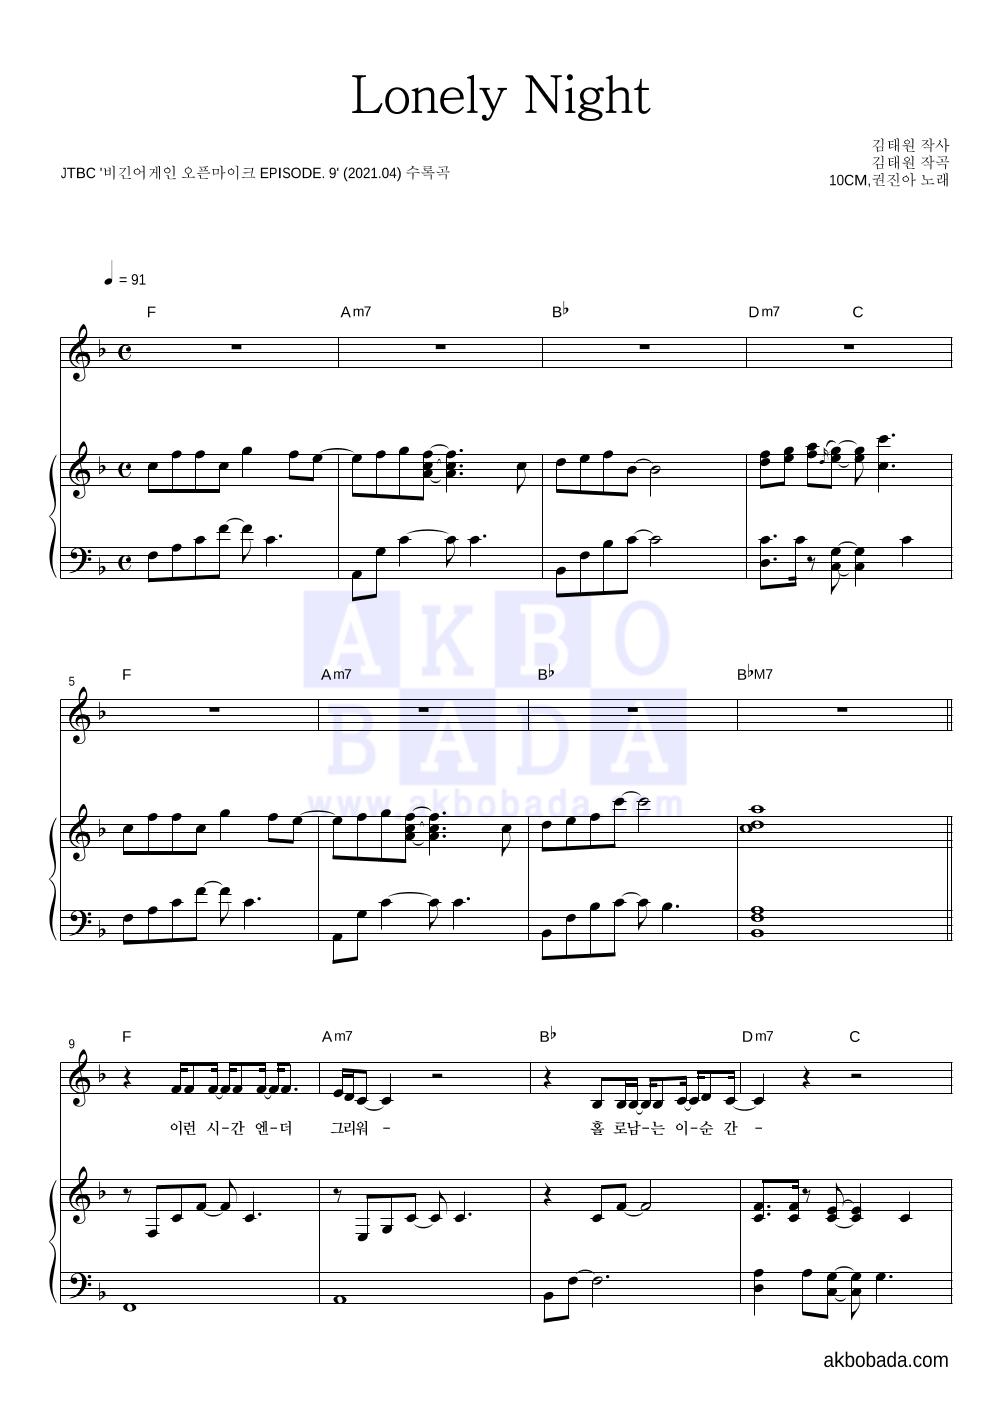 10CM,권진아 - Lonely Night 피아노 3단 악보